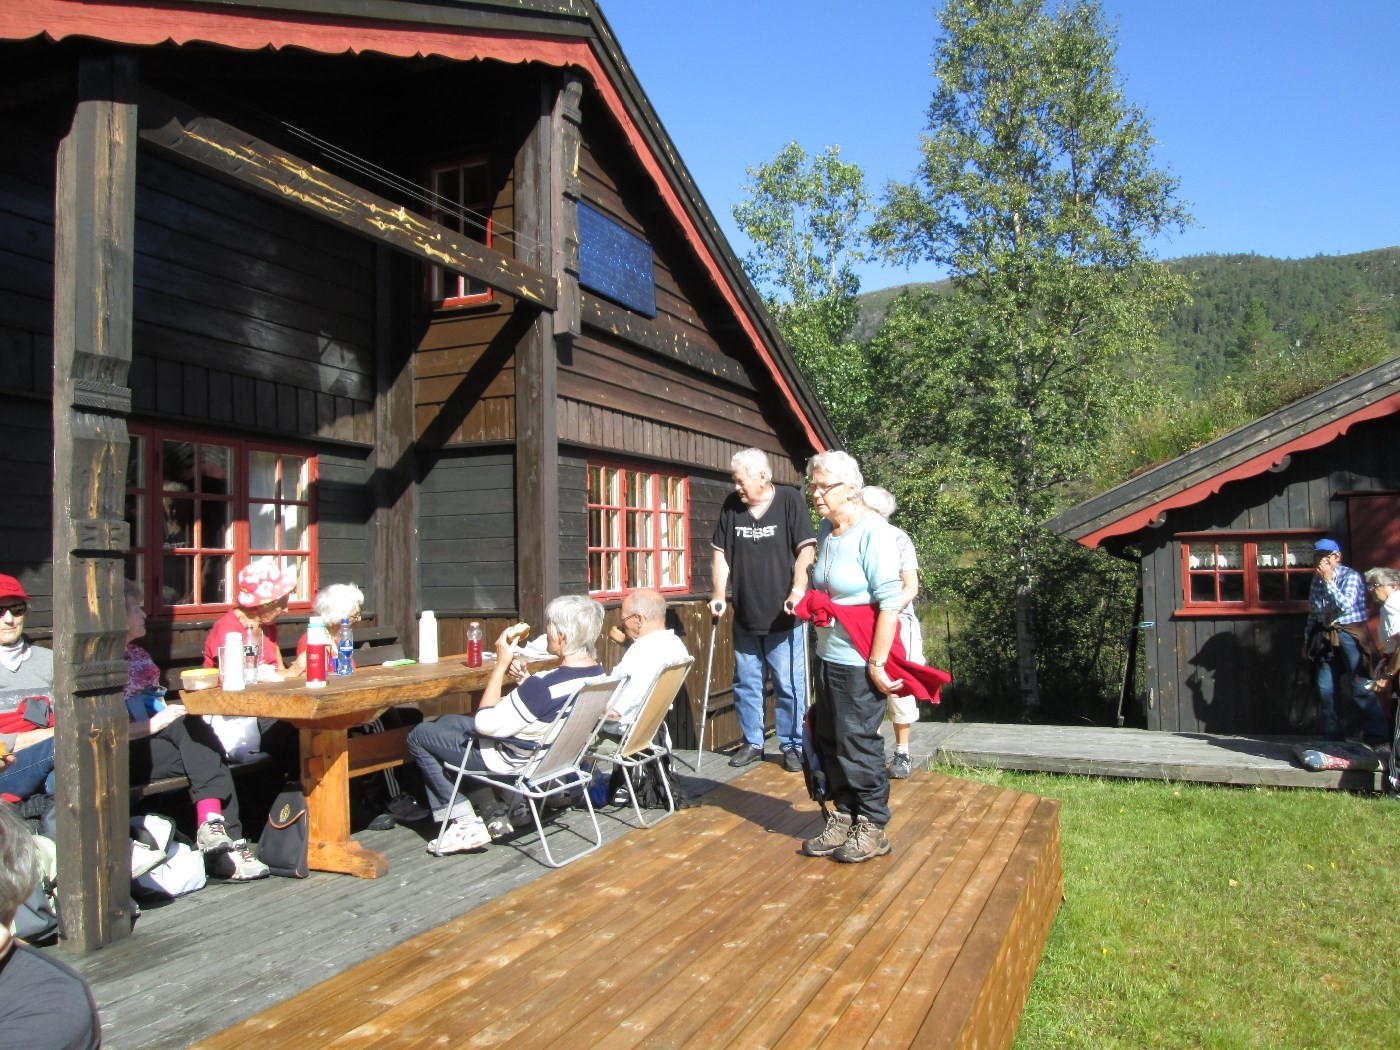 Kaffepause ved hytta til Randi og Vidar Sogge i Vindøldalen.  foto: Per Bruset